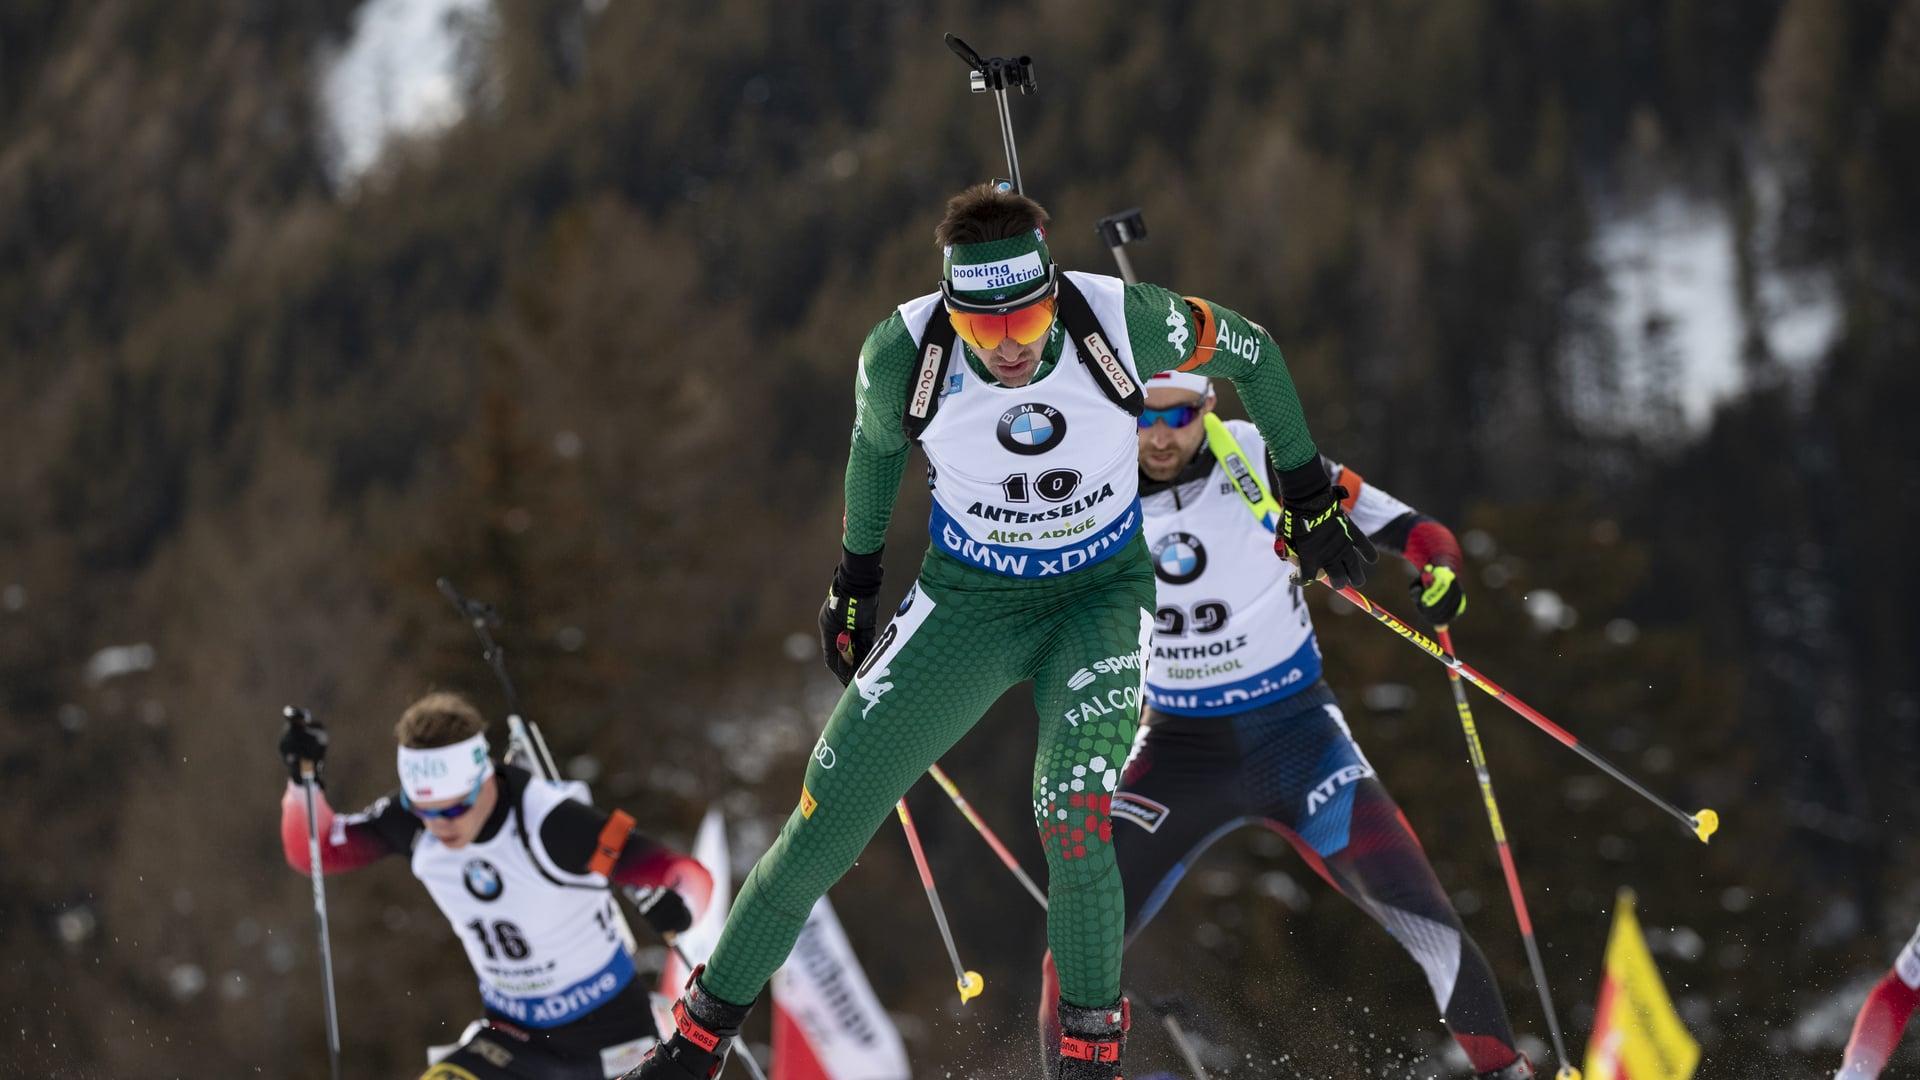 Biathlon Italien Pokal<br />22.-24.03.2019